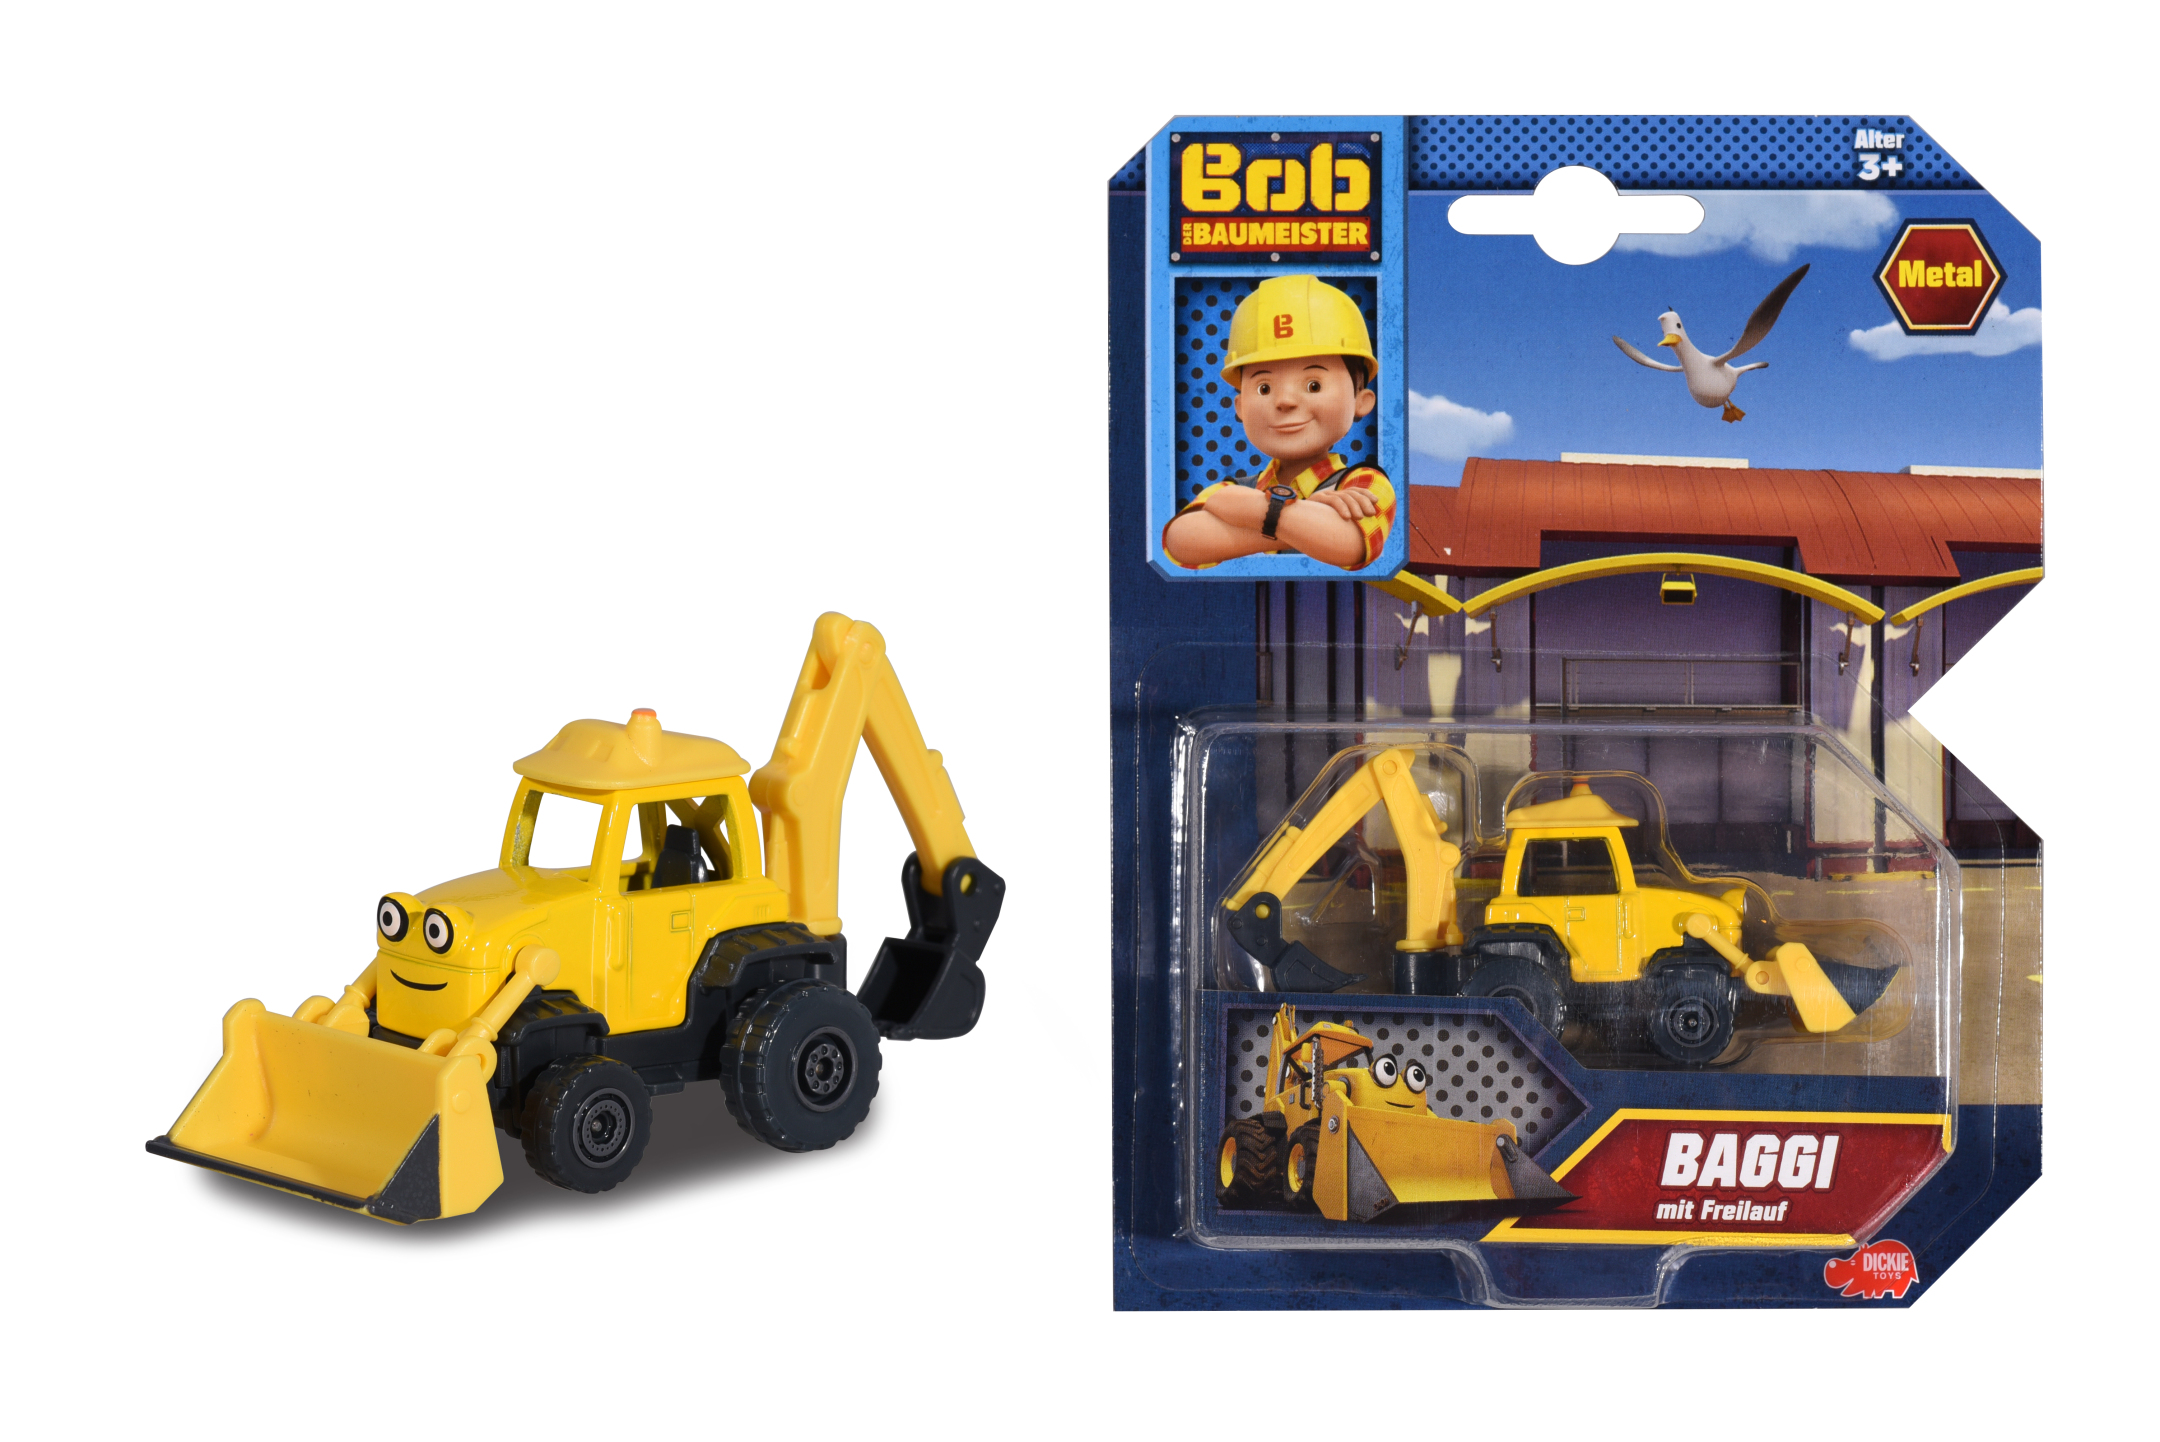 Bob der Baumeister Baggi